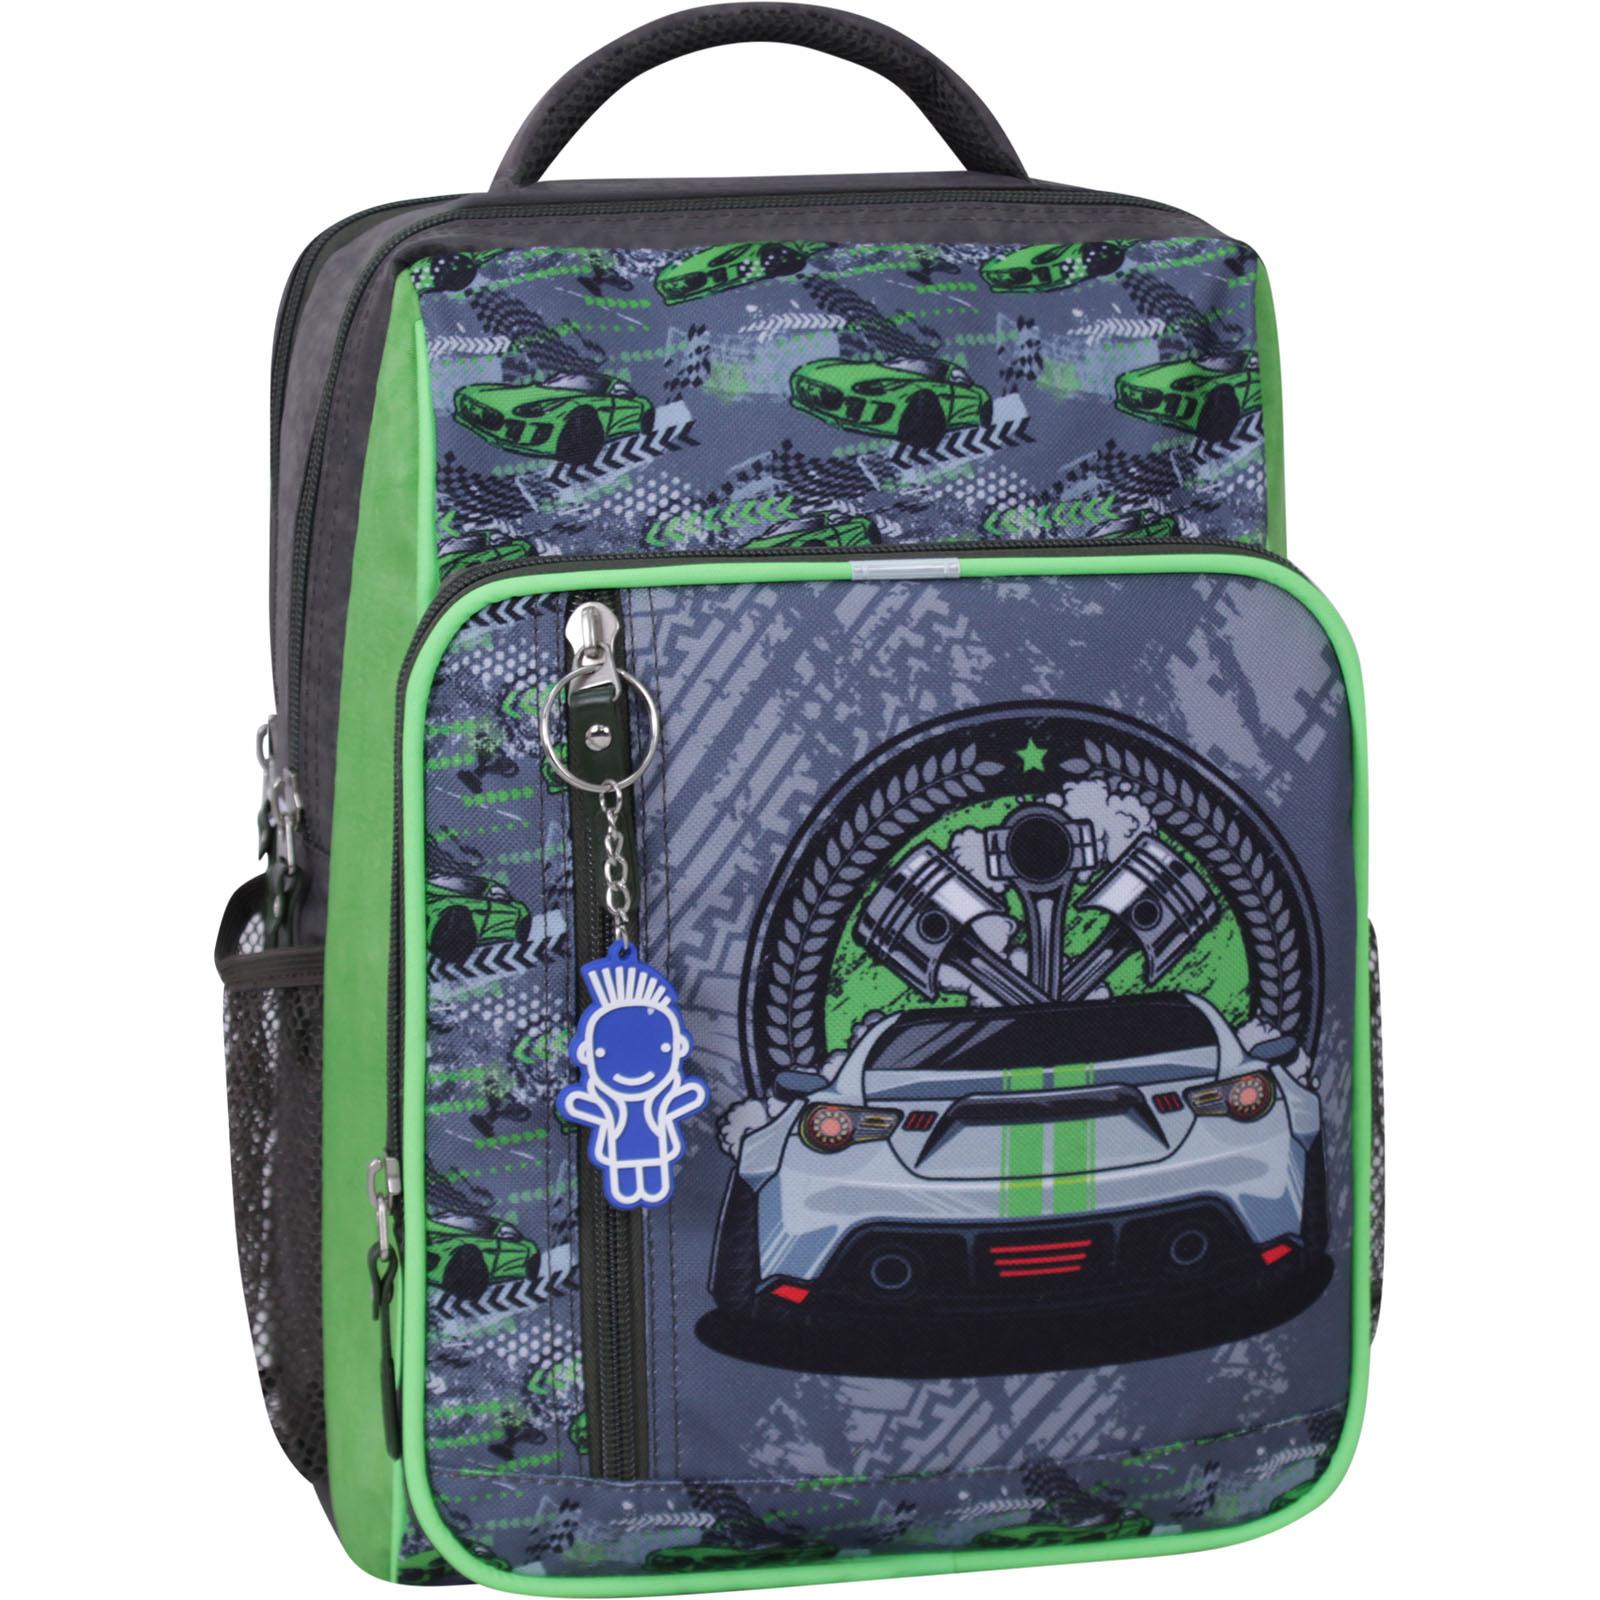 Школьные рюкзаки Рюкзак школьный Bagland Школьник 8 л. хаки 903 (0012870) IMG_0259_суб_903_-1600.jpg